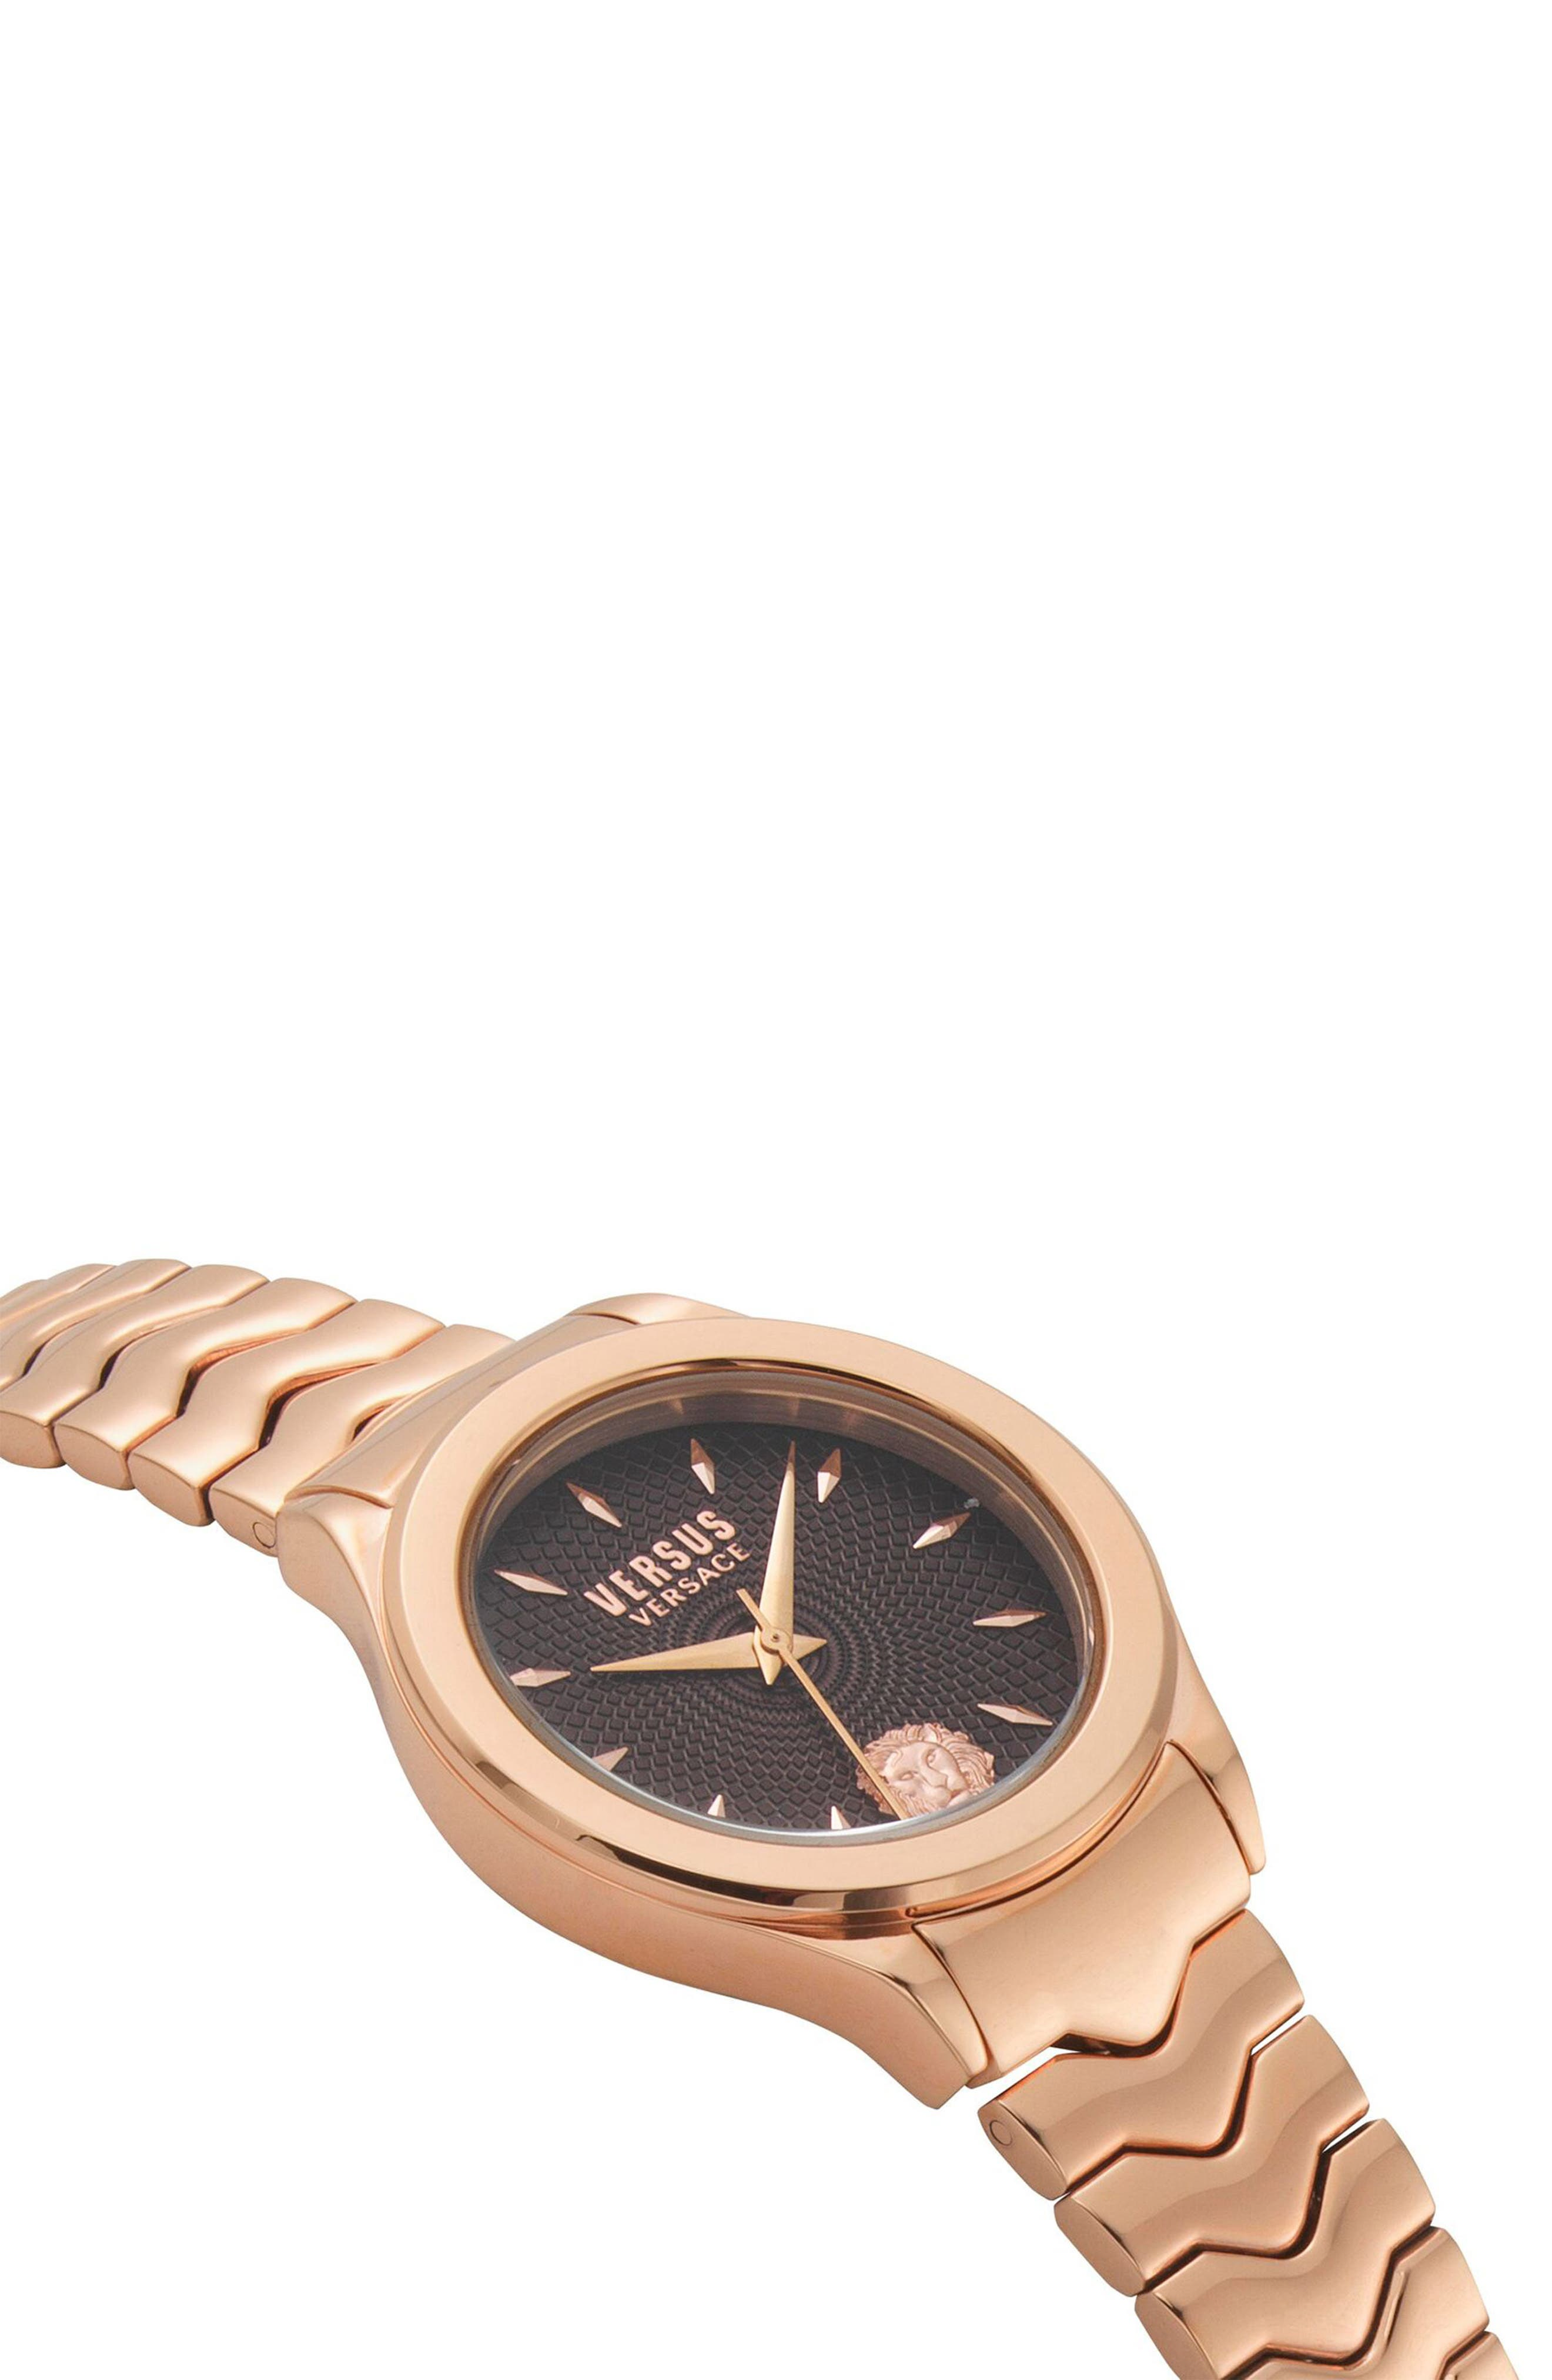 VERSUS VERSACE, Mount Pleasant Bracelet Watch, 34mm, Alternate thumbnail 3, color, ROSE GOLD/ BLACK/ ROSE GOLD